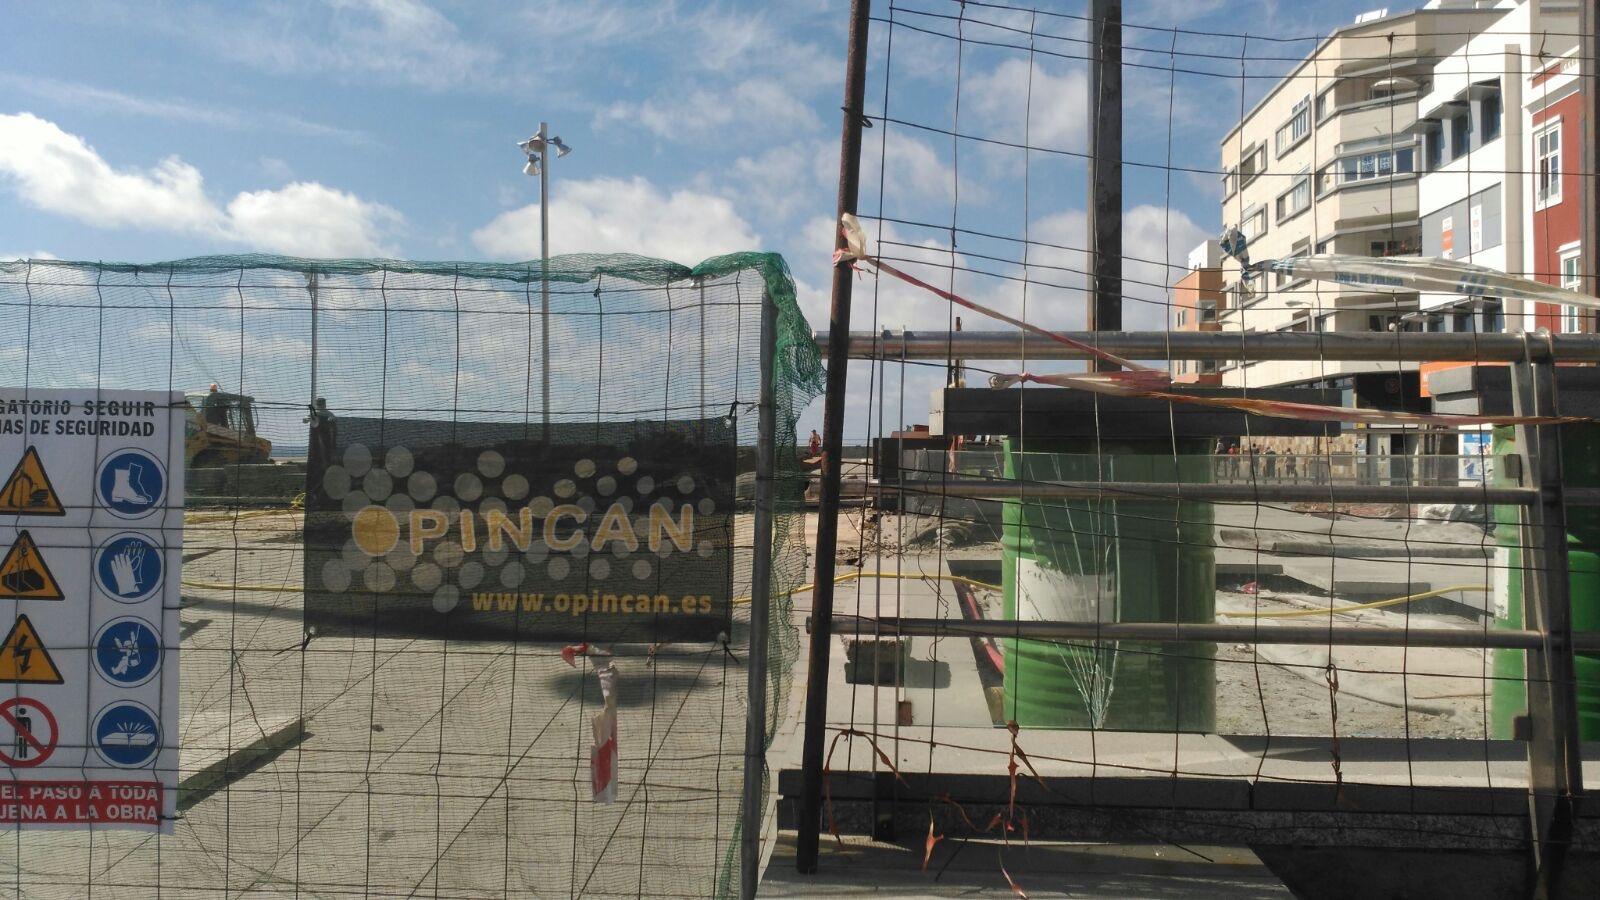 Adjudicación de rehabilitación a Opincan